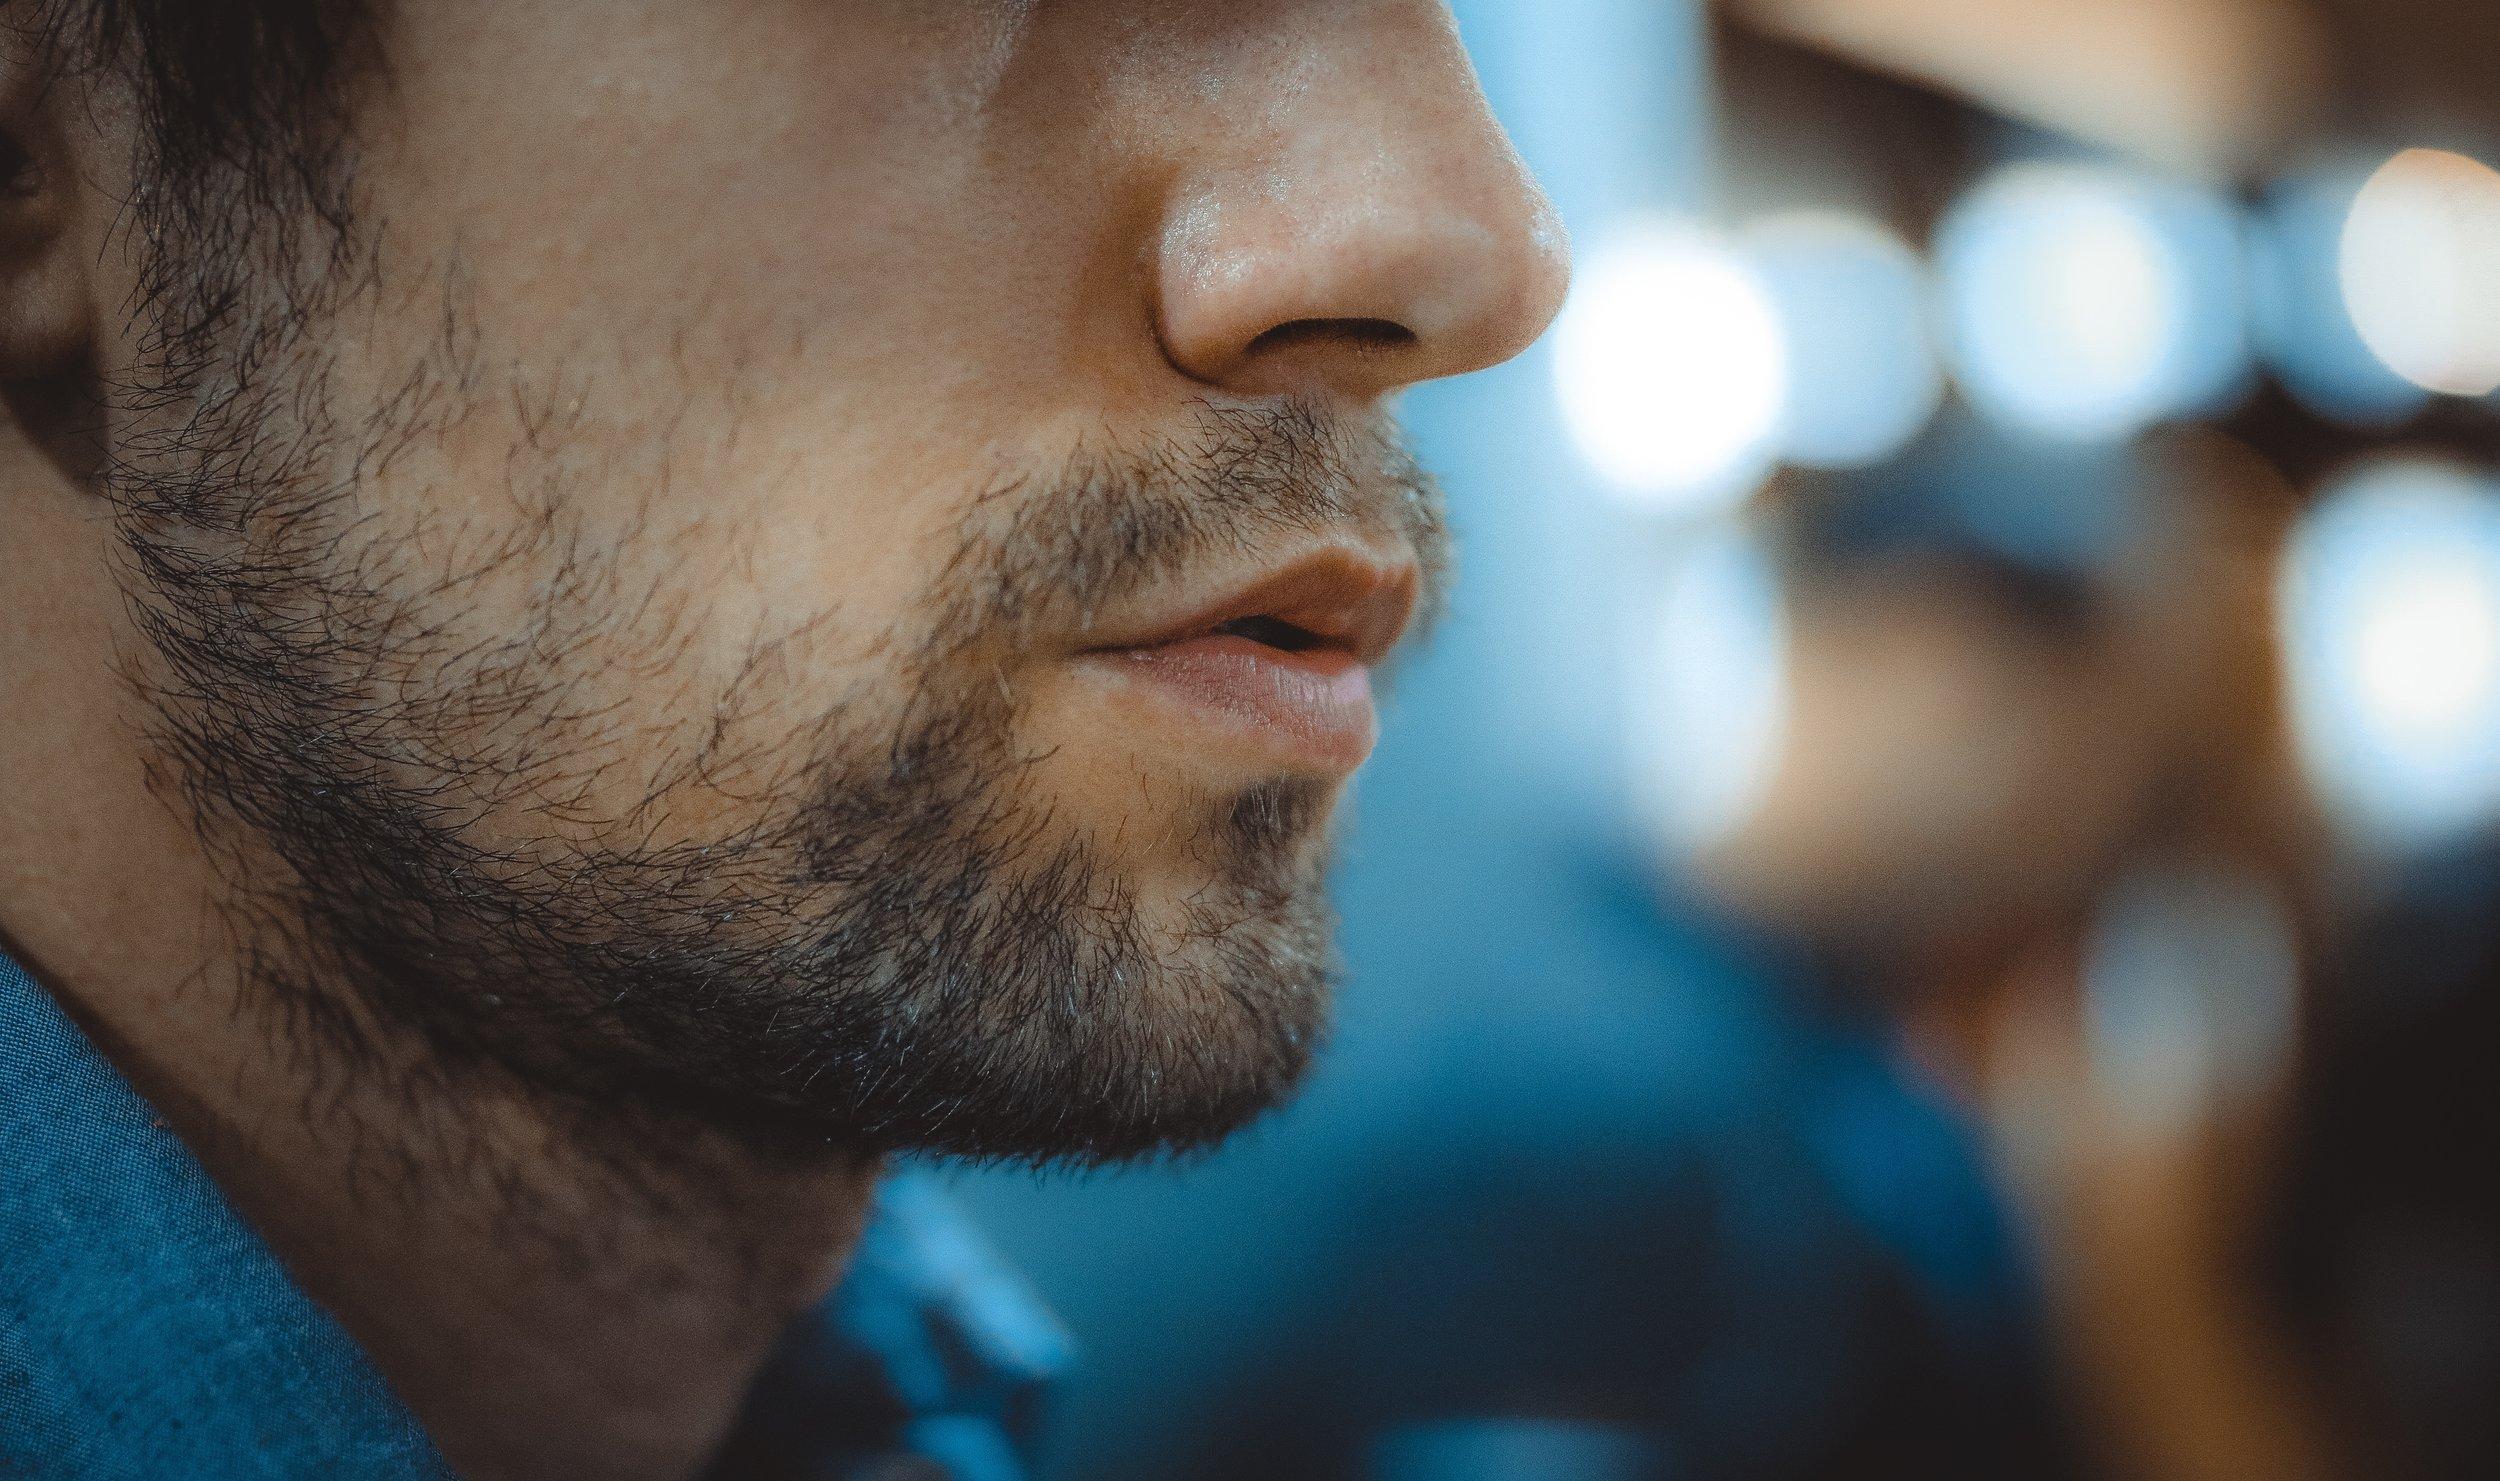 adult-attractive-beard-413764 (1).jpg